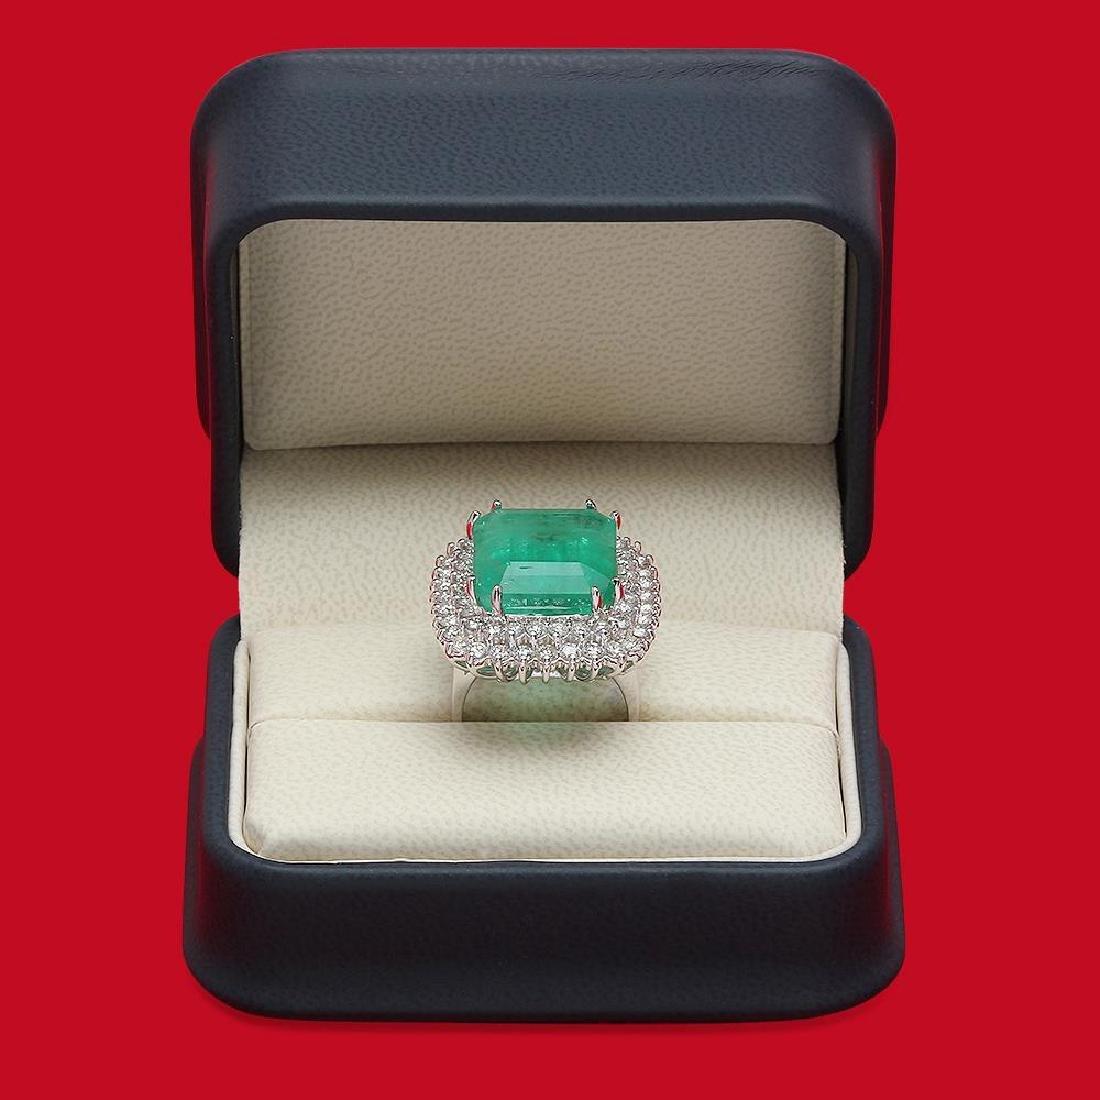 14K Gold 19.12 Emerald 2.75 Diamond Ring - 4